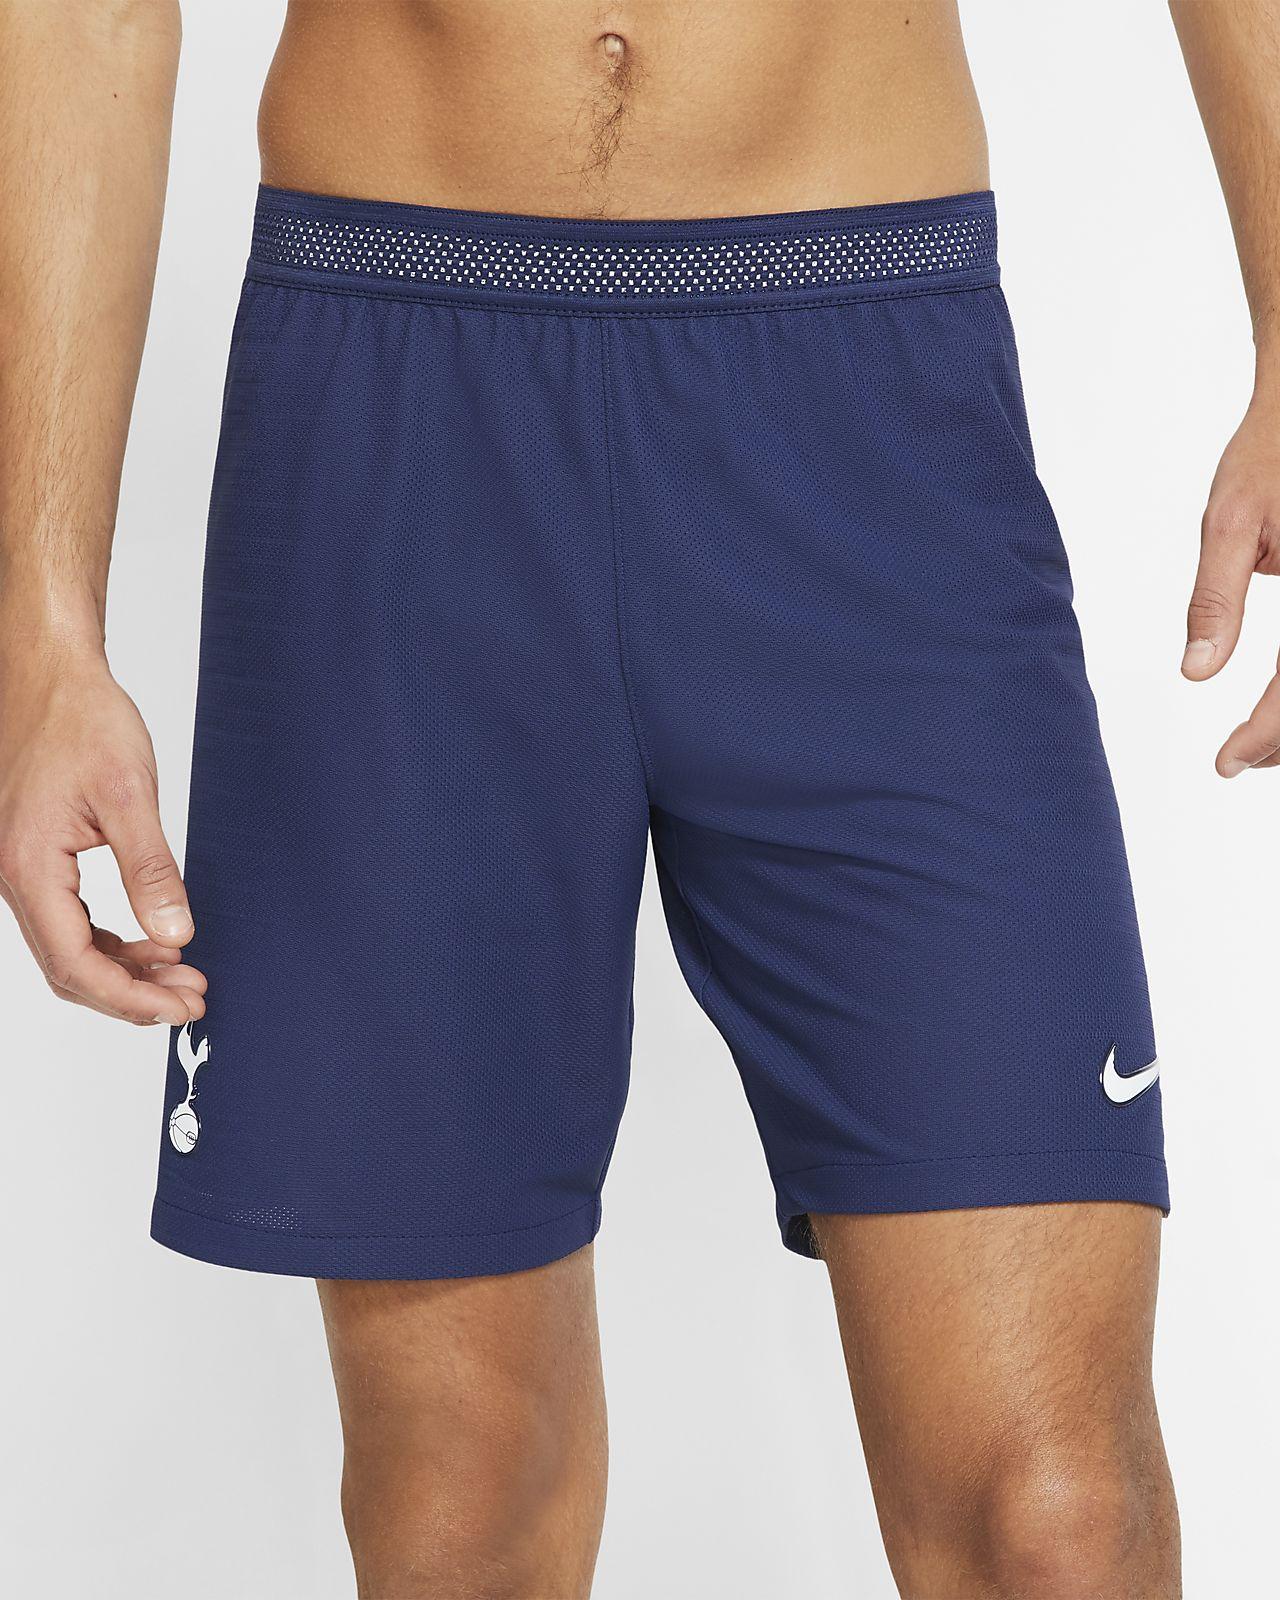 Shorts de fútbol para hombre Vapor Match de local/visitante del Tottenham Hotspur 2019/20